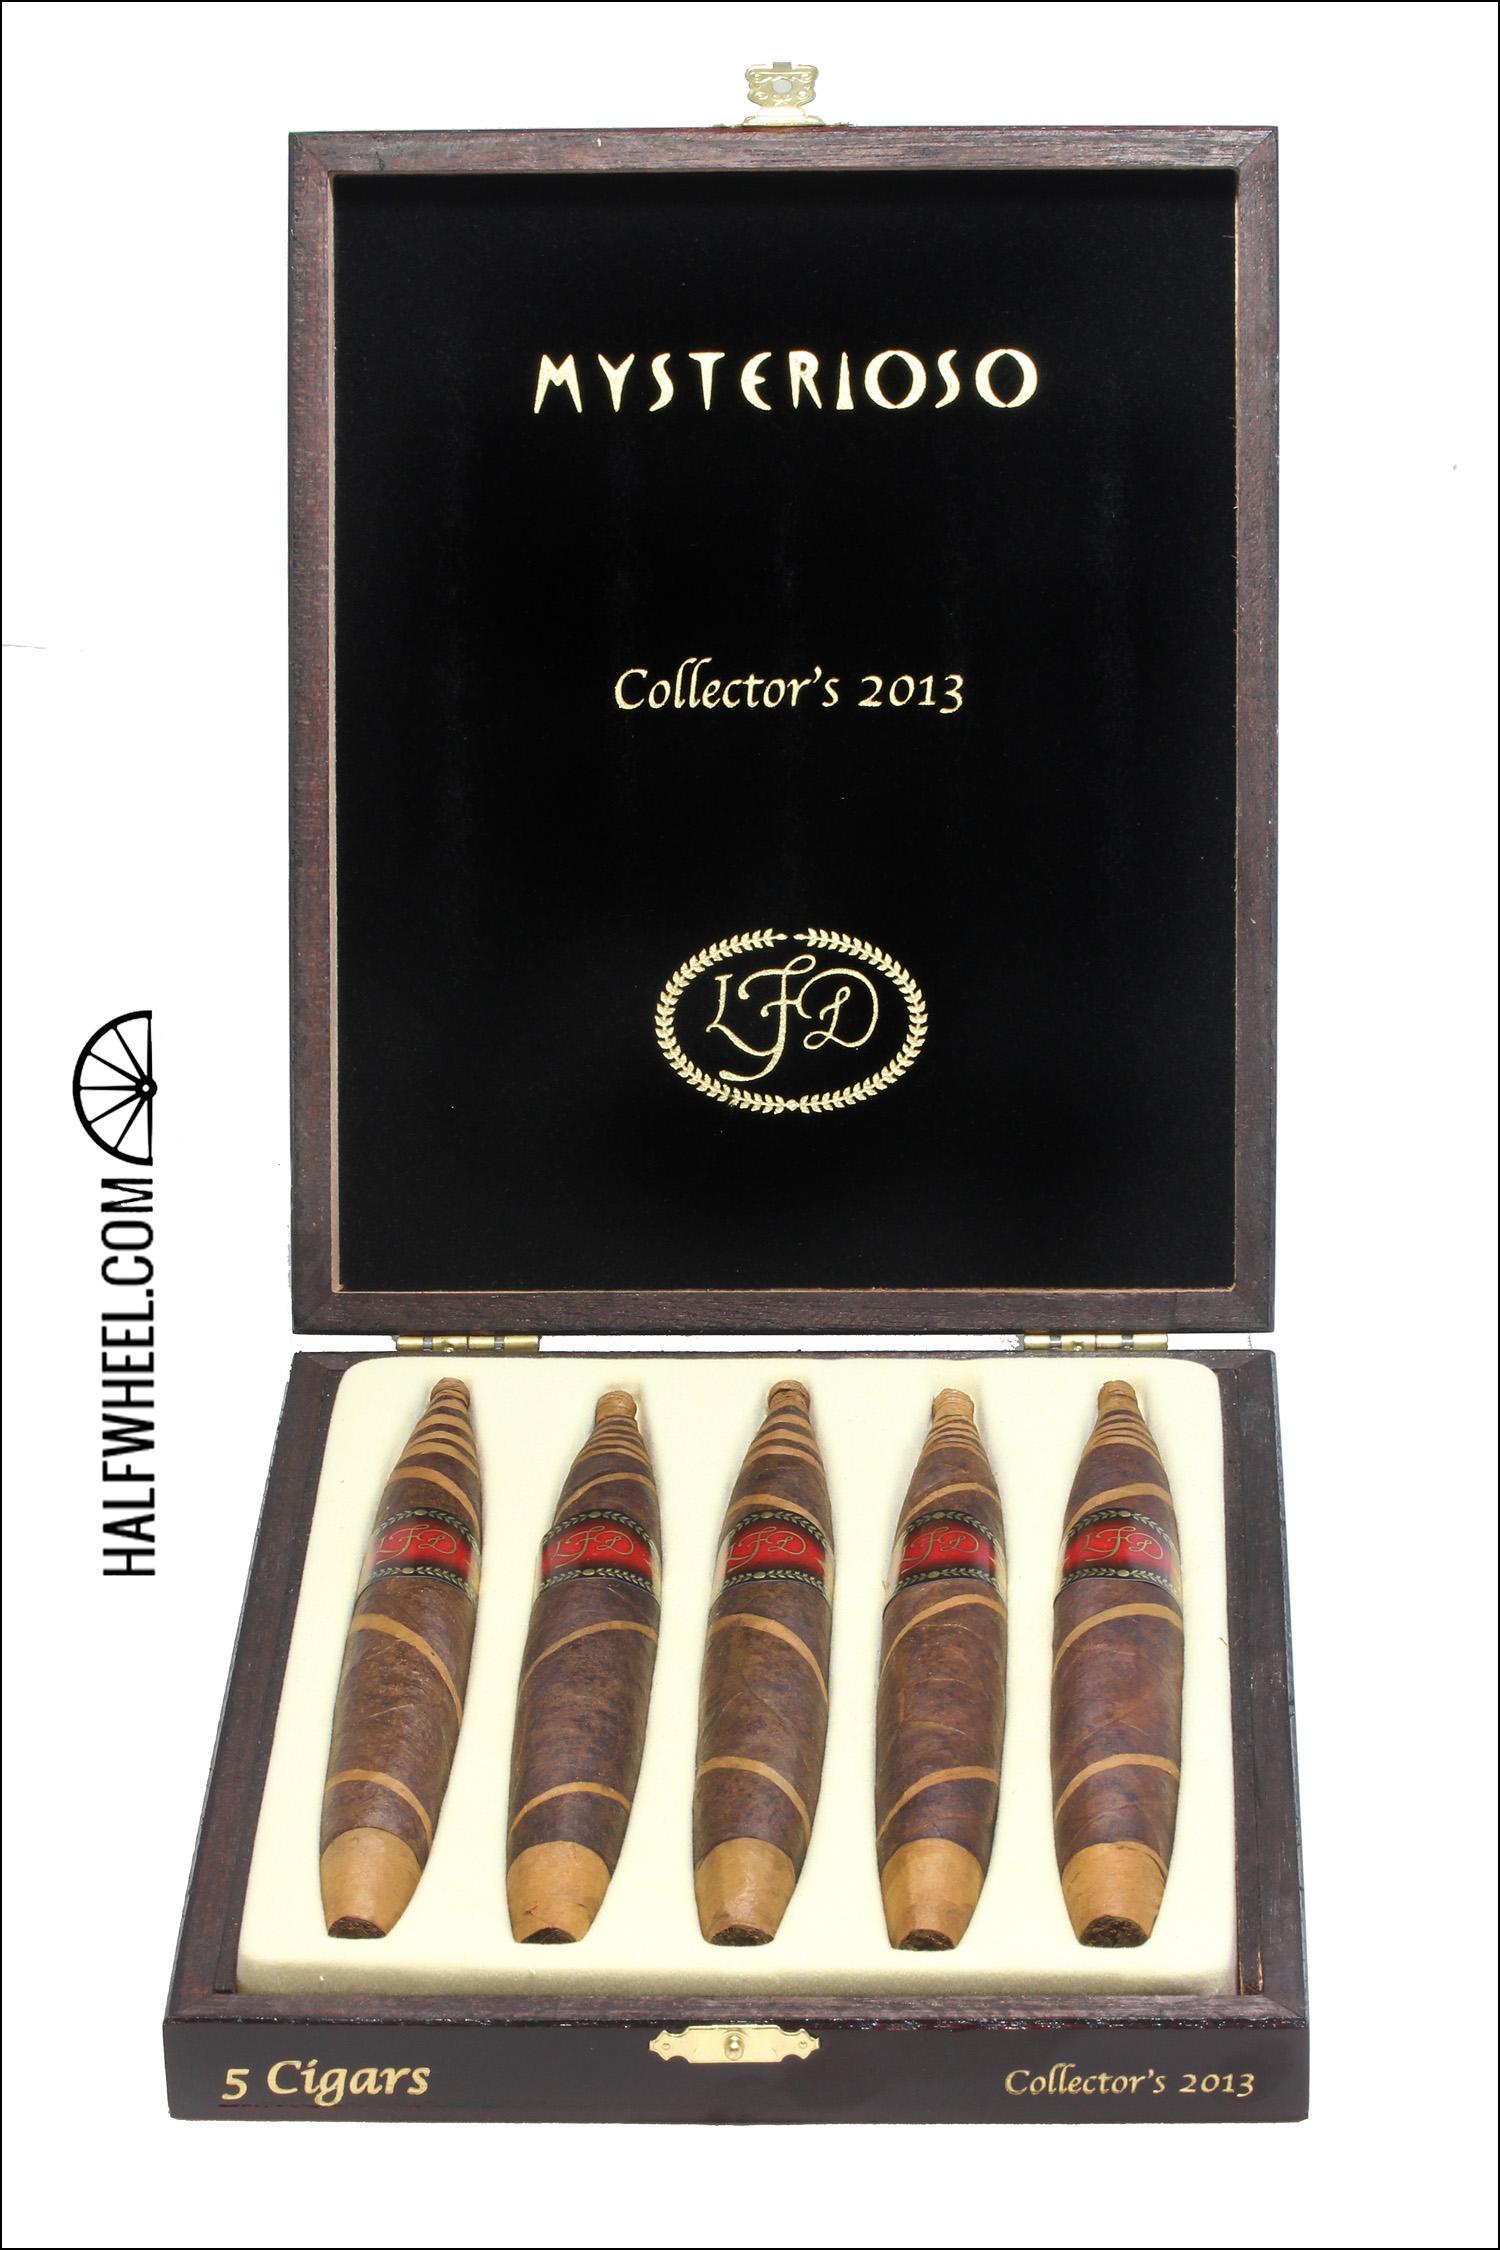 La Flor Dominicana Mysterioso Collector s 2013 Box 2